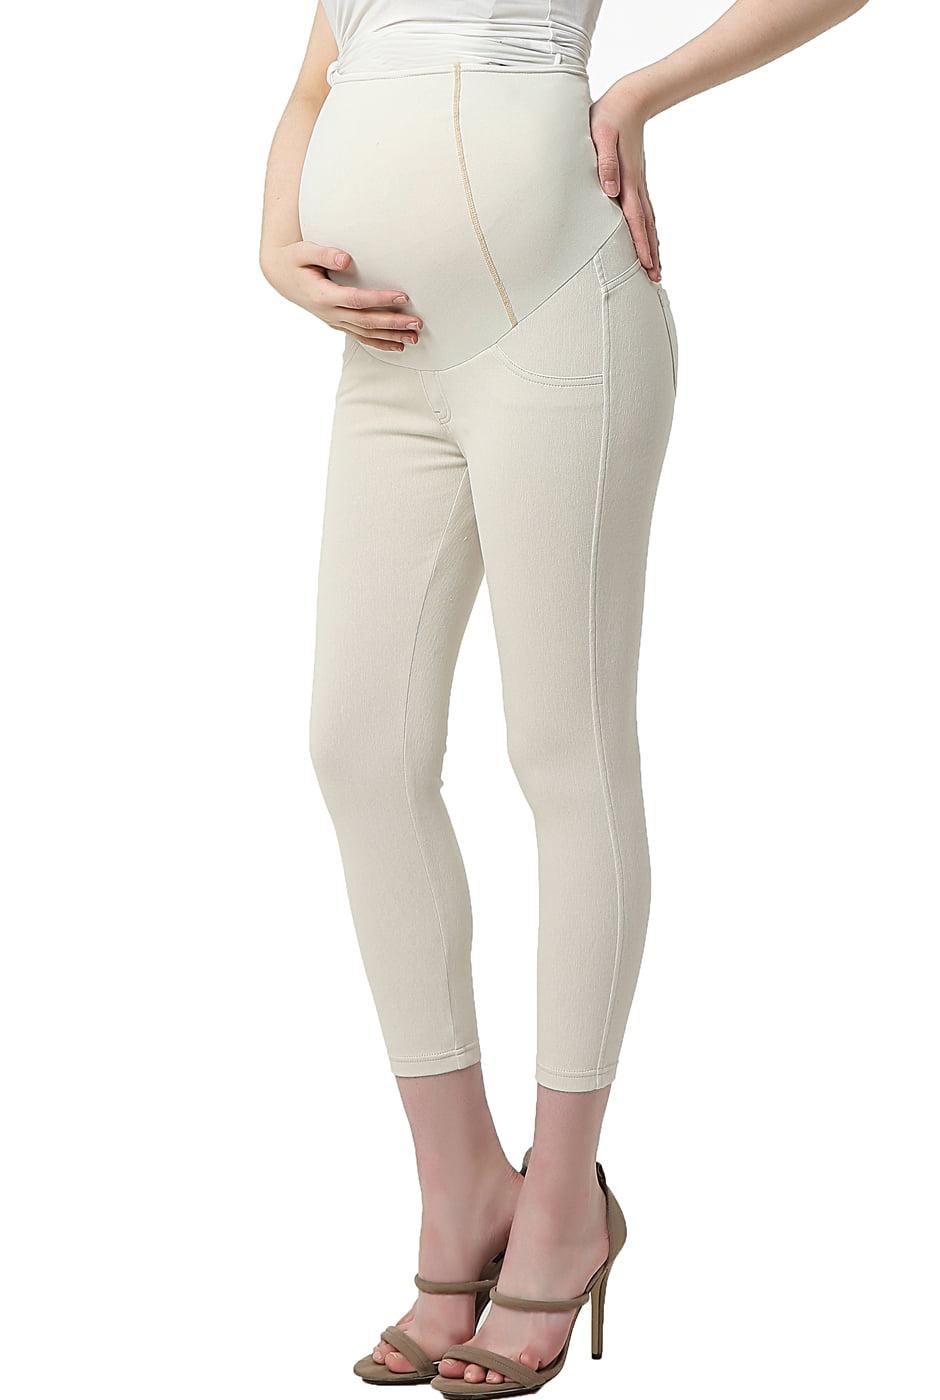 Maternity Women's Cropped Jeggings - Tan M